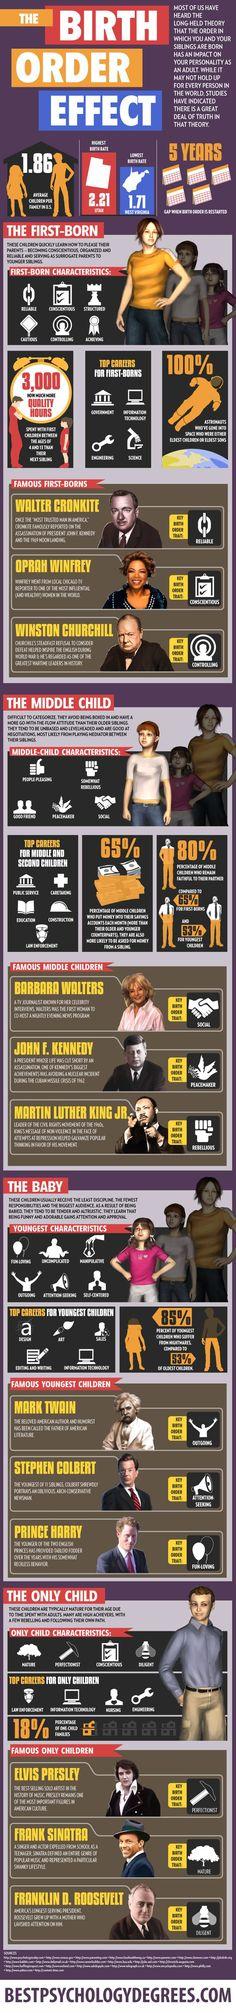 Birth order effect: infographic